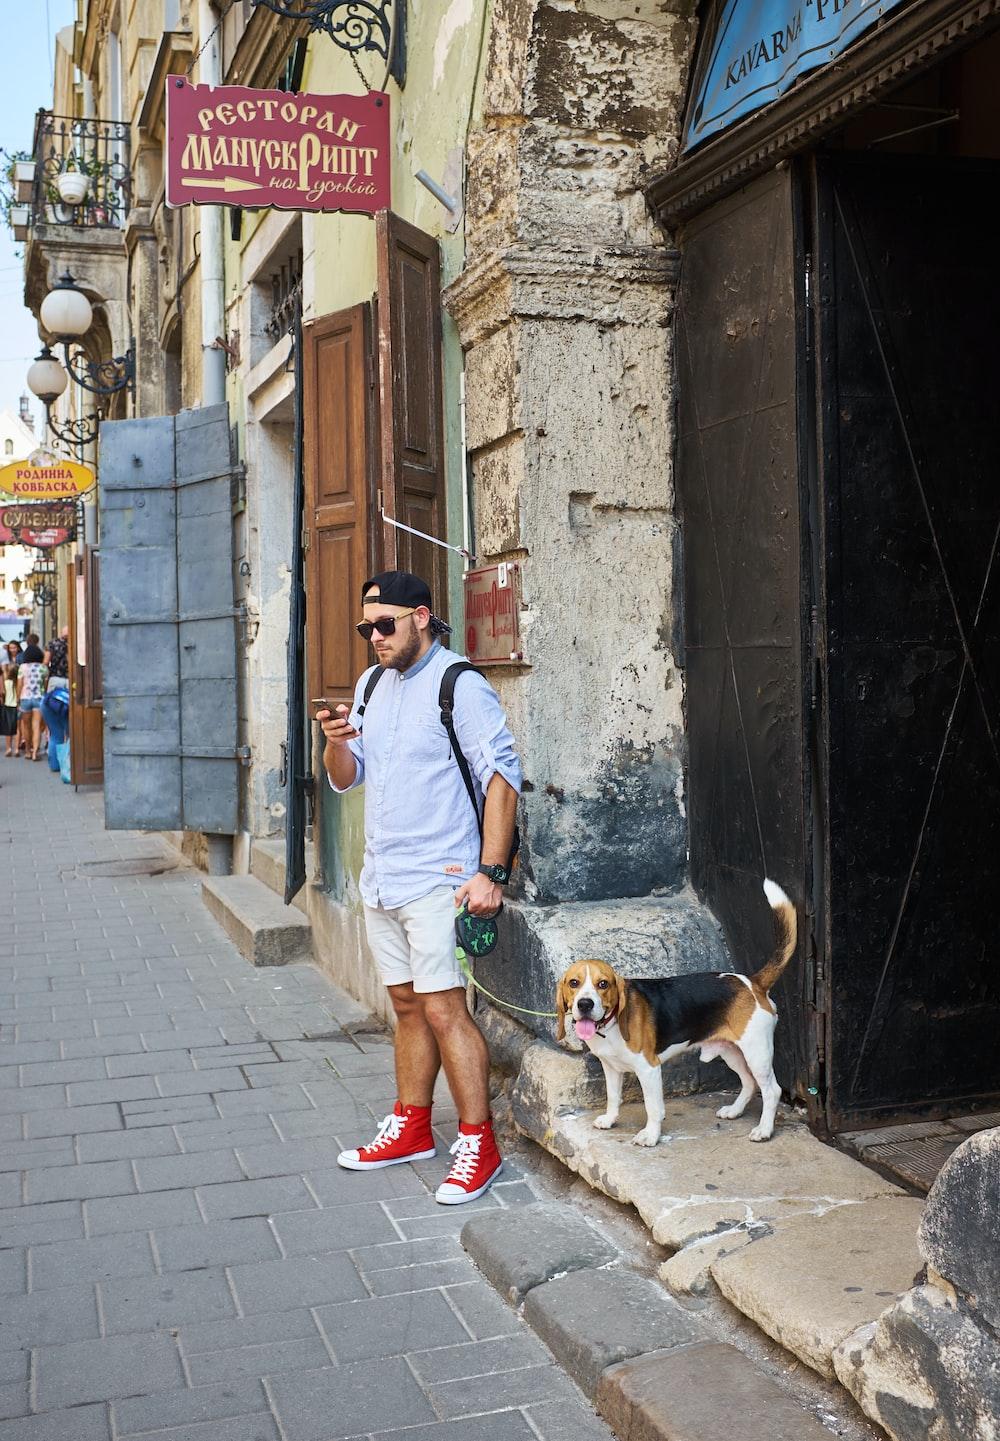 man beside beagle near building structure